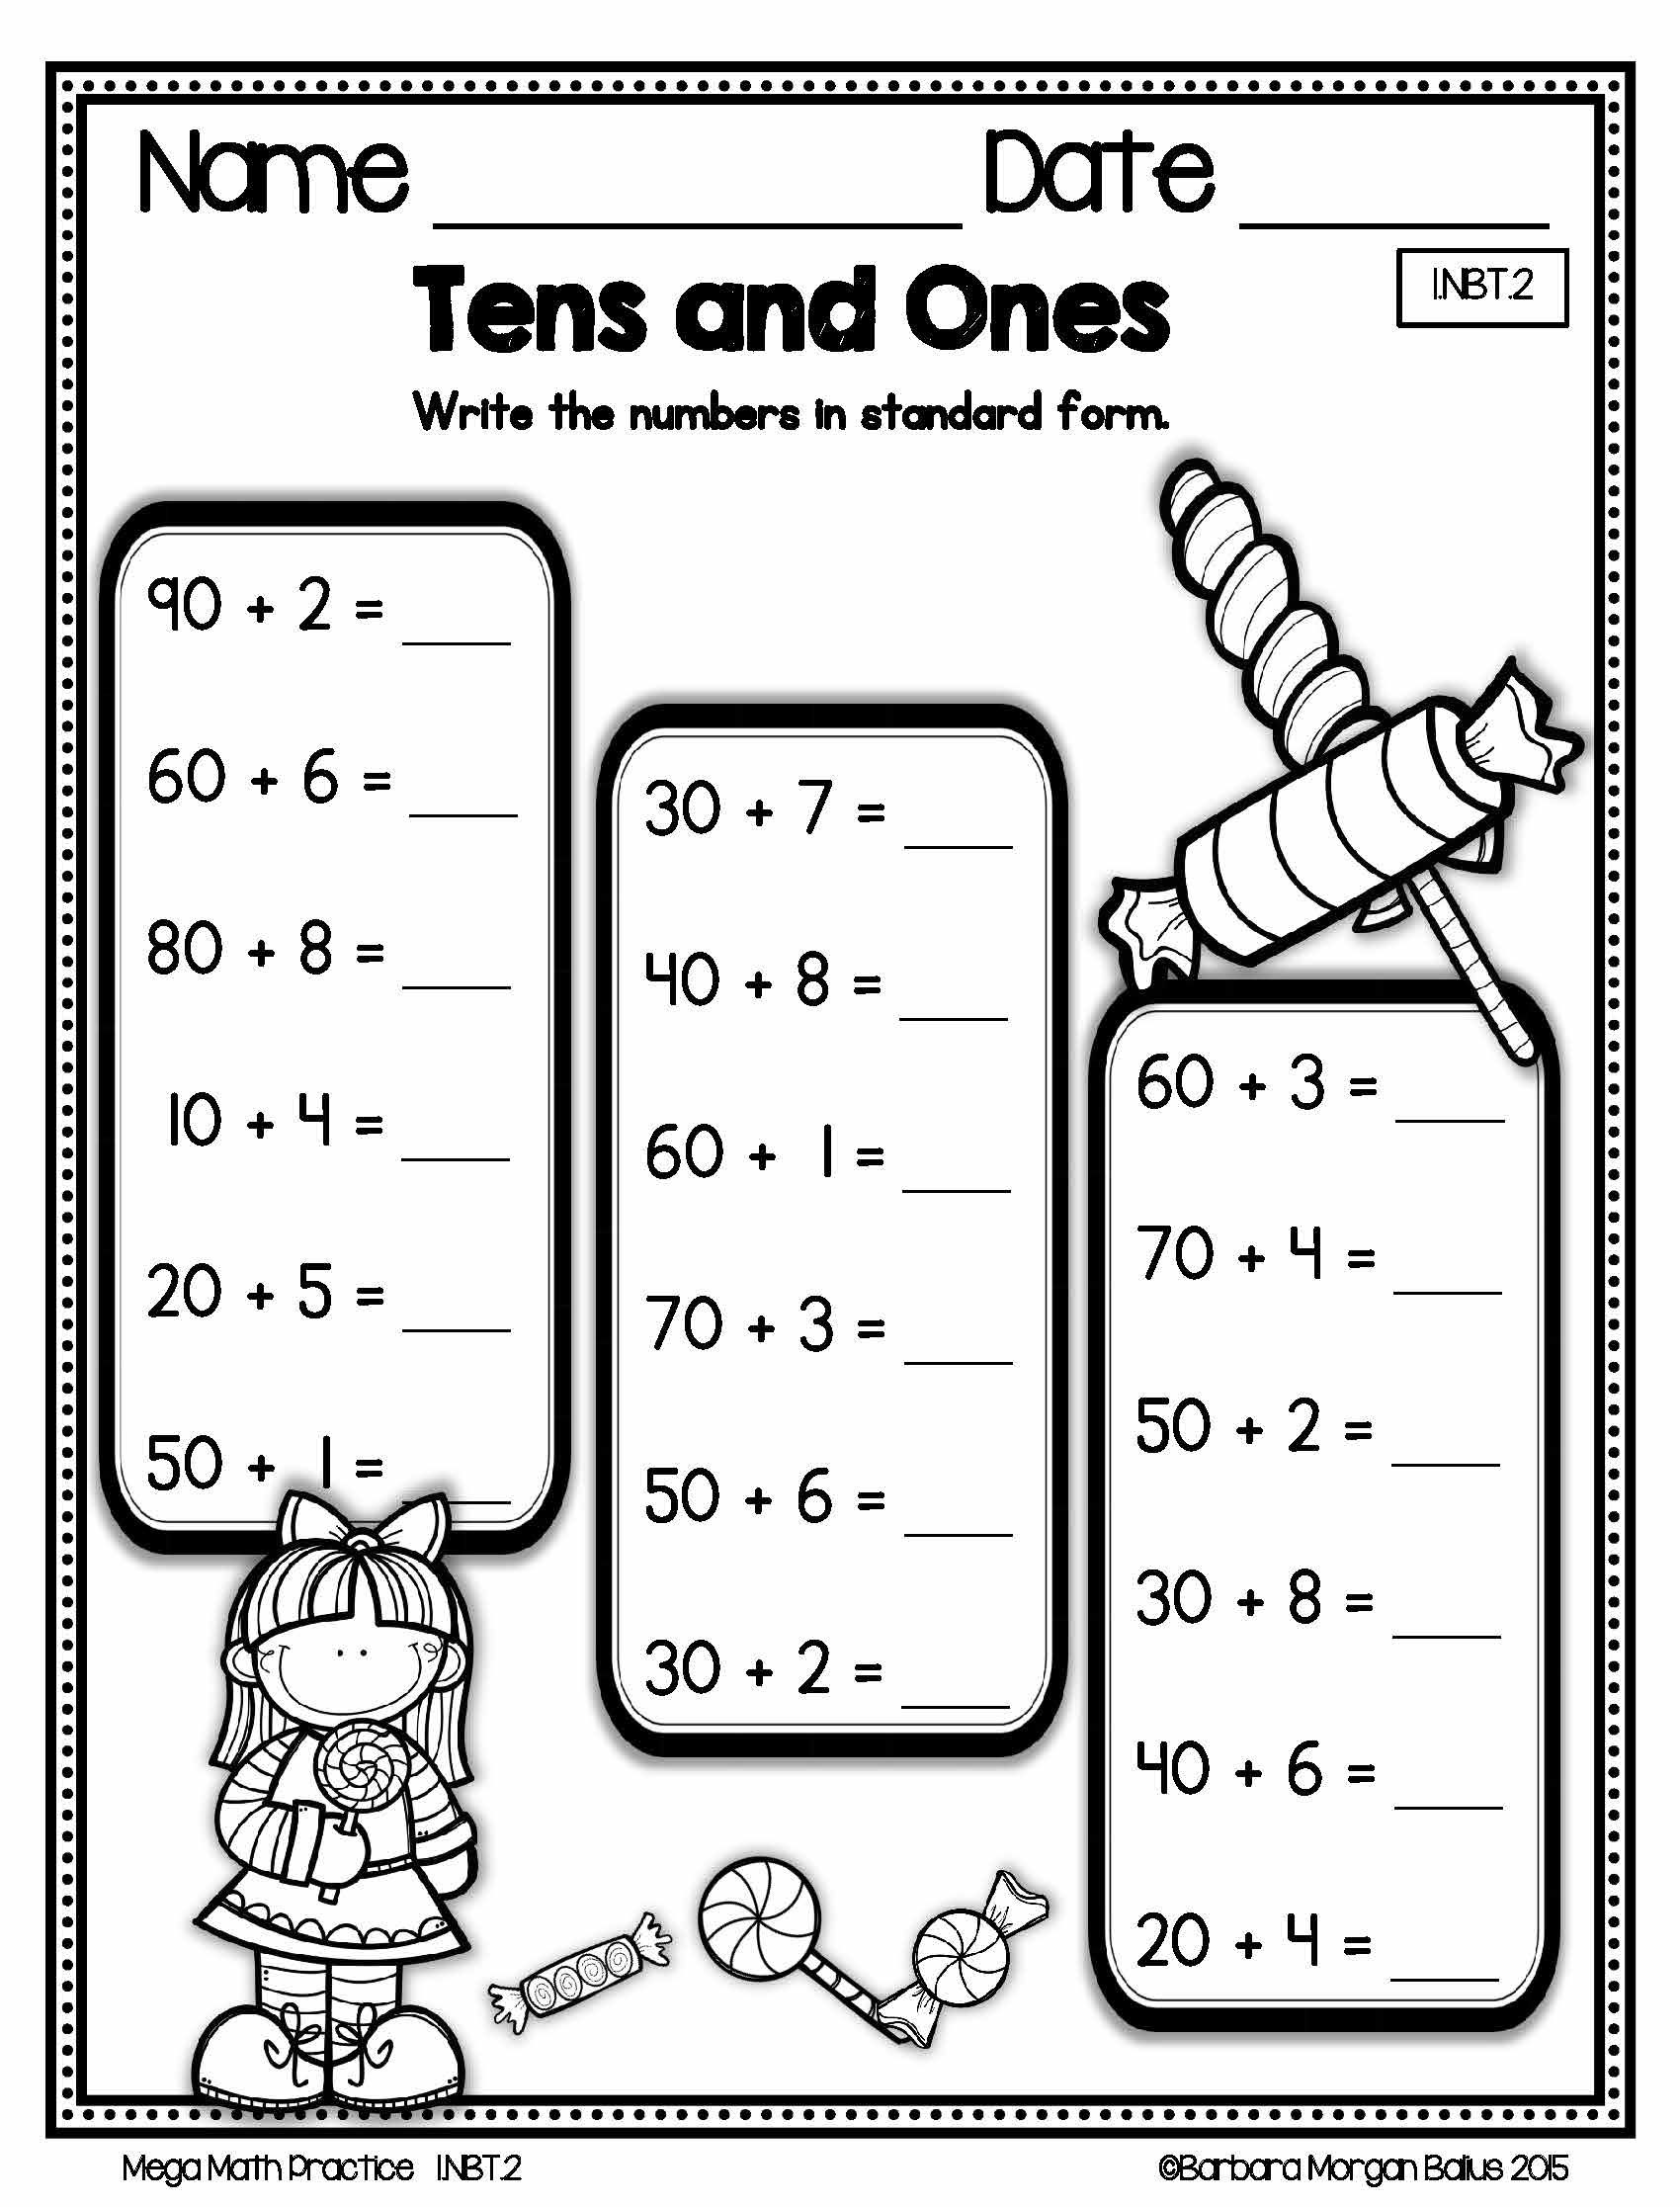 Number Sense Morning Work Place Value First Grade Math Mega Practice 1 Nbt 2